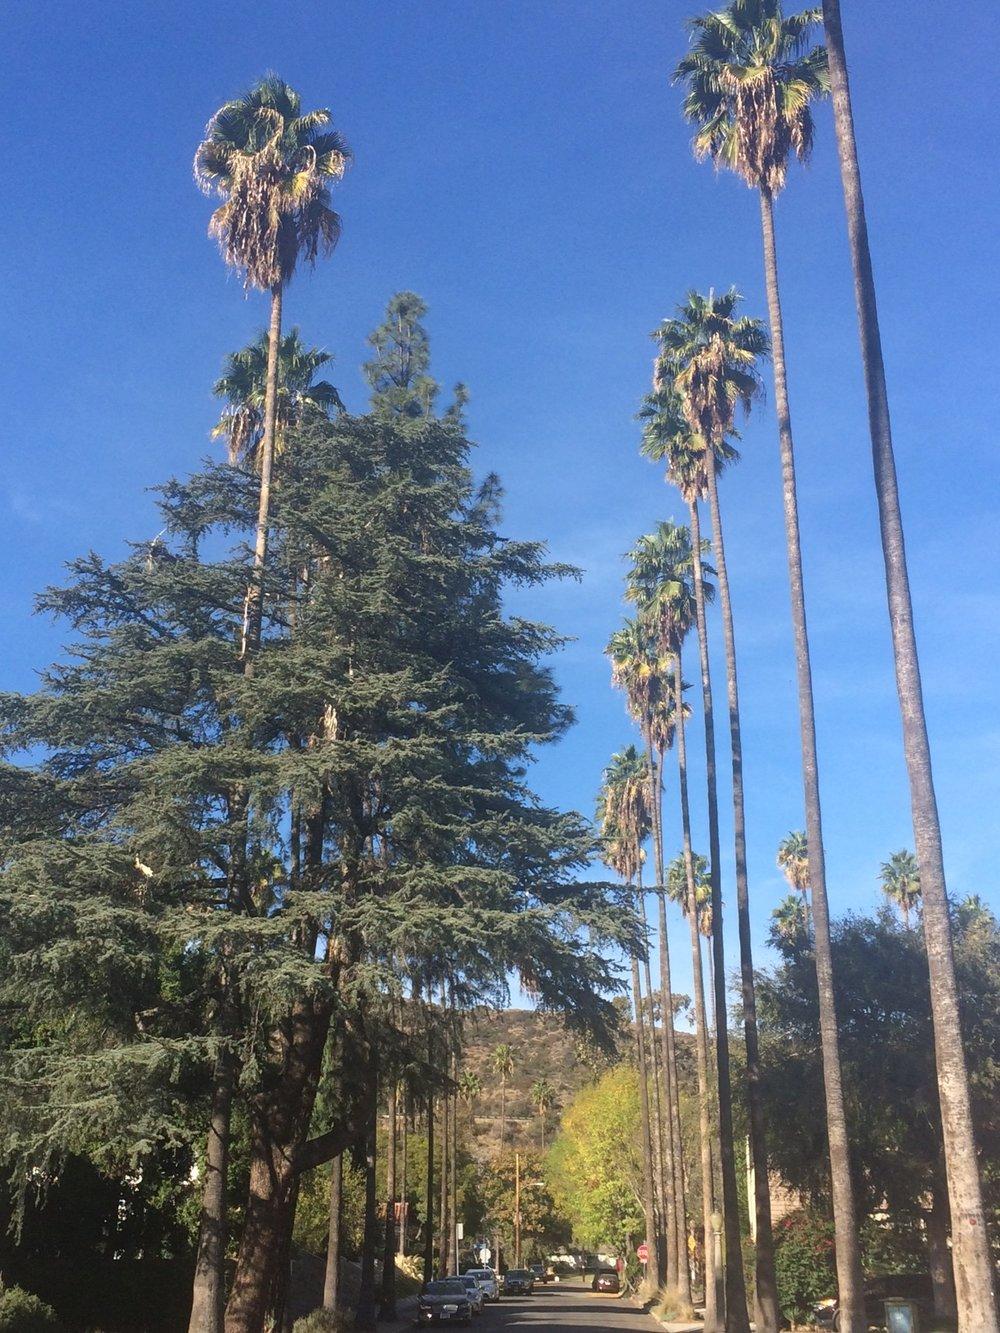 Palm Trees Street_2.JPG